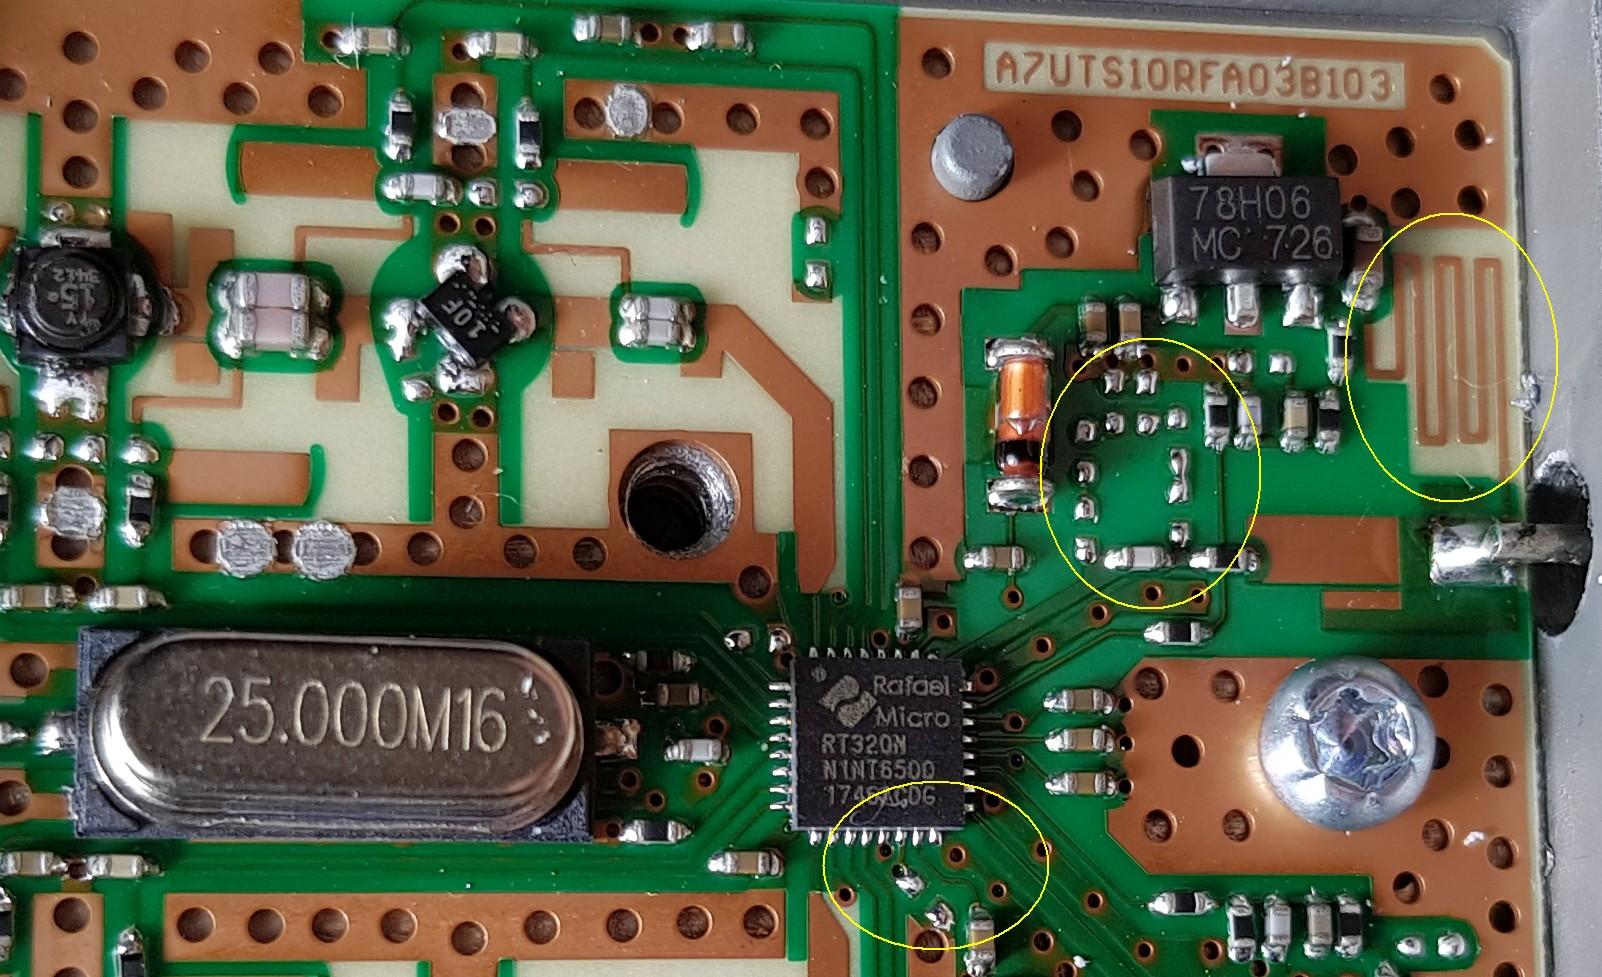 c band lnb circuit diagram the new amsat dl qo 100 downconverter v3d amsat germany  amsat dl qo 100 downconverter v3d